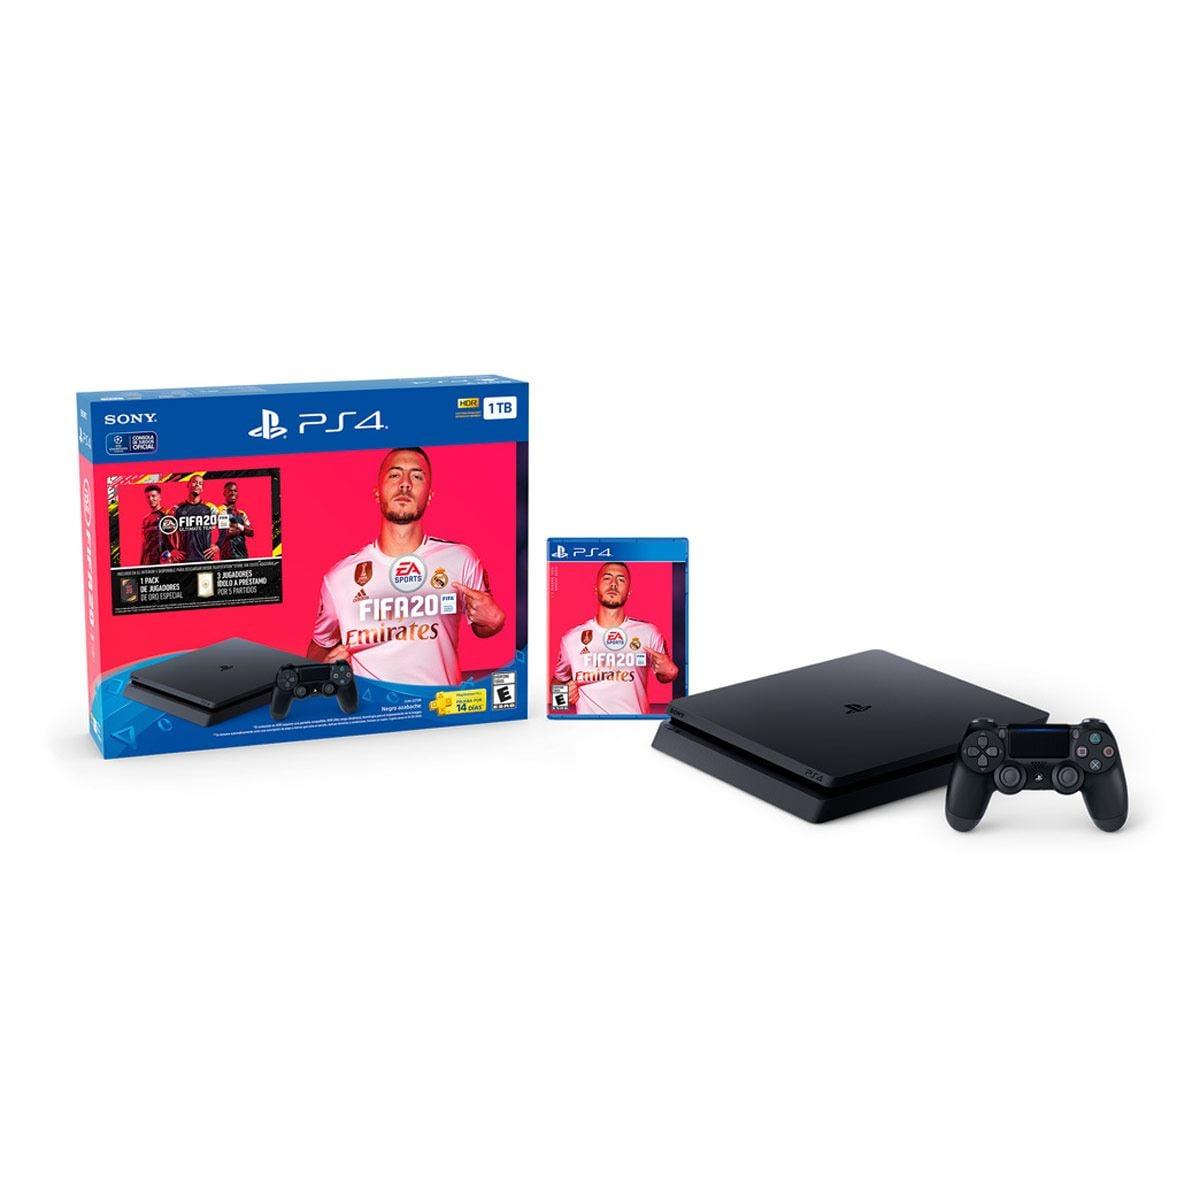 Consola PS4 Fifa 20 Lat 1TB